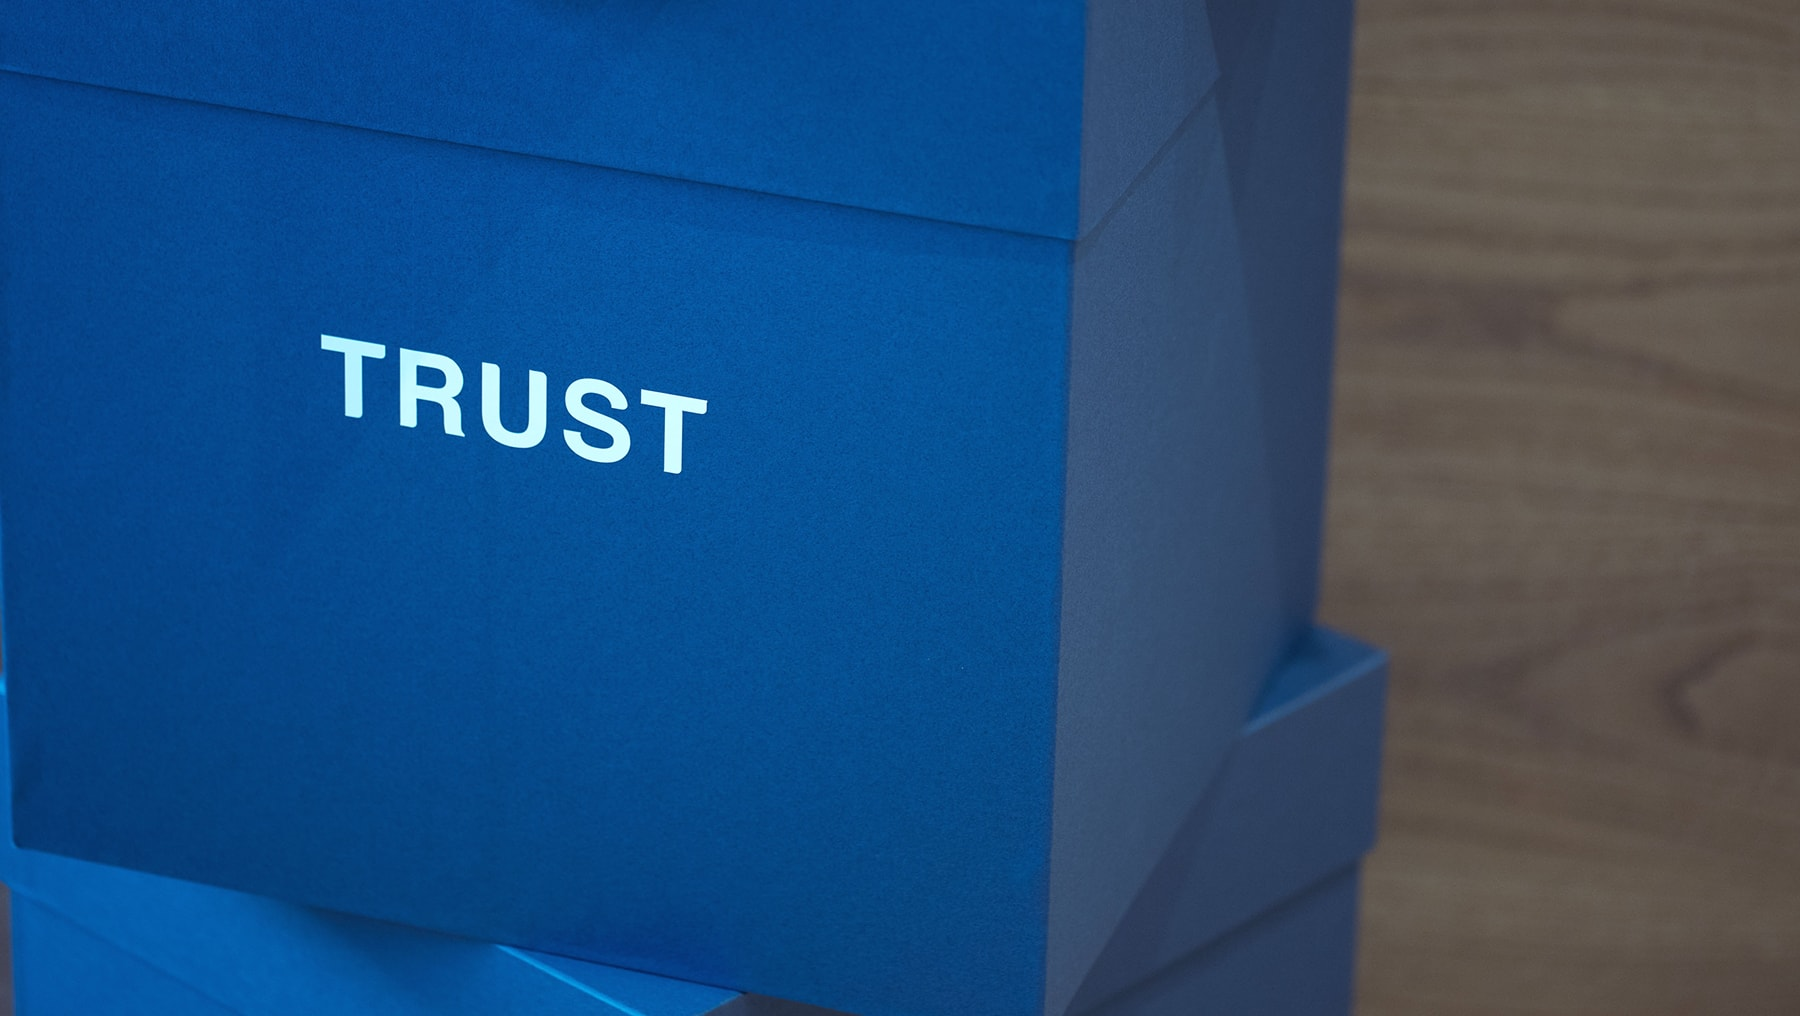 TRUST-BOX